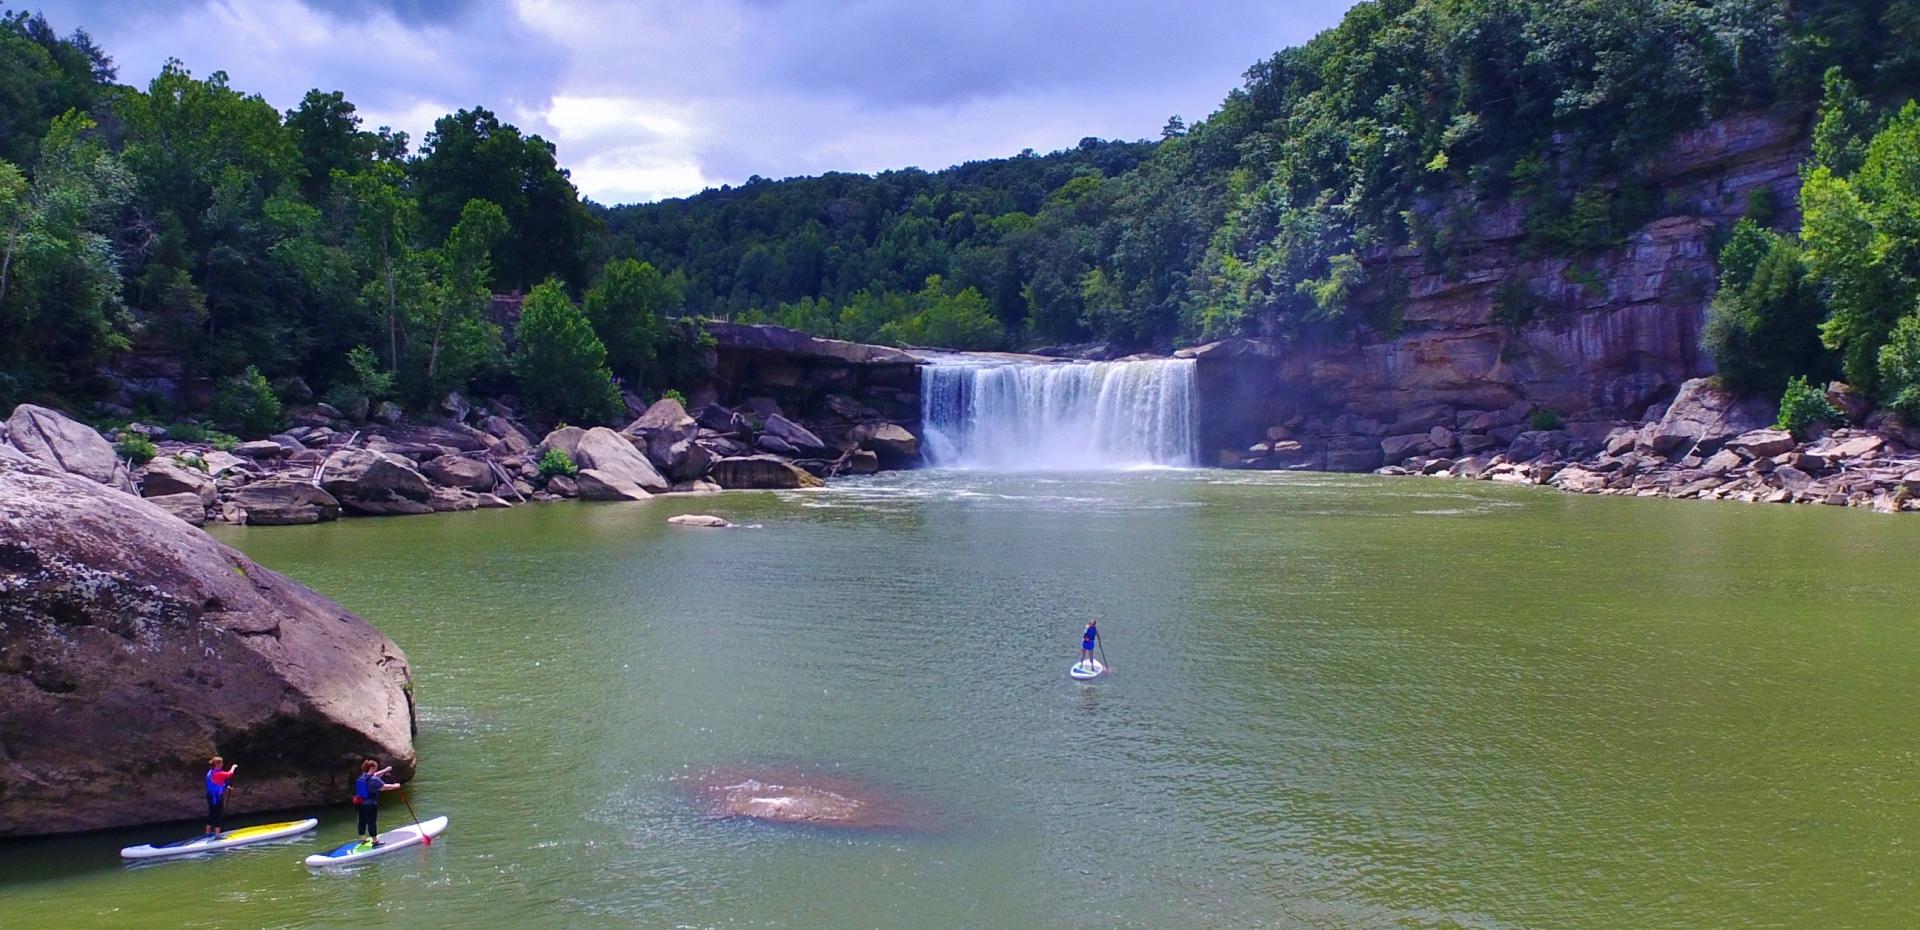 cumberland falls sup, grotto falls sup, supkentucky, sup ky, supky